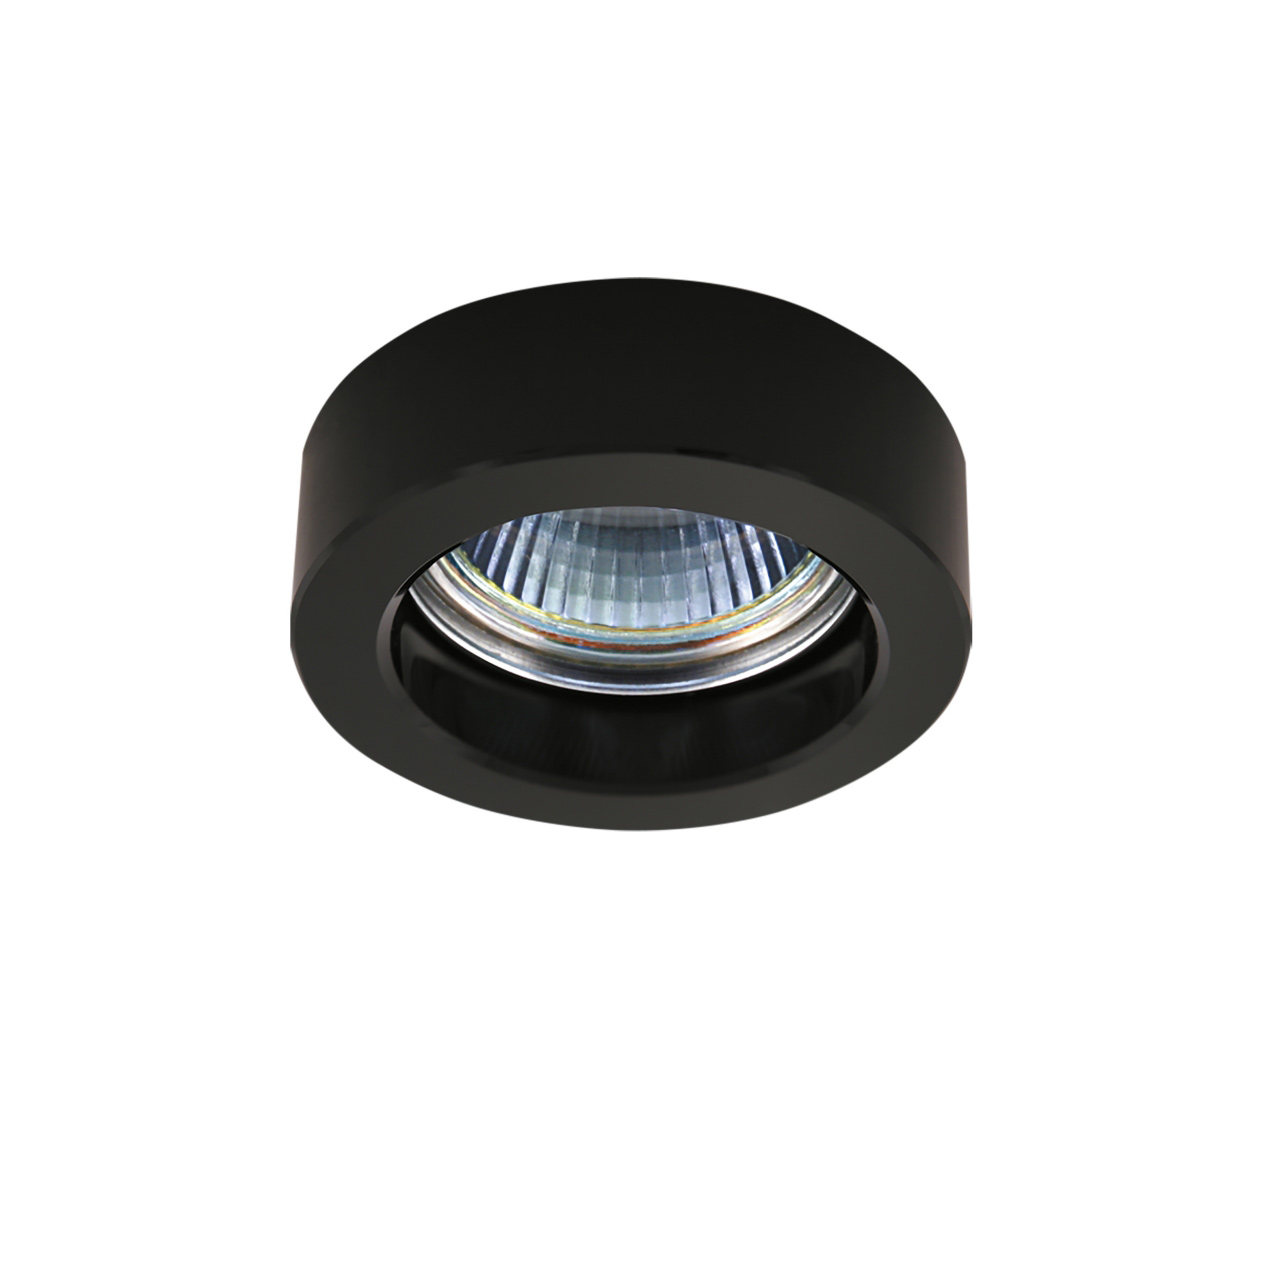 Светильник Lei Mini BL MR16 / HP16 хром / черный Lightstar 006137